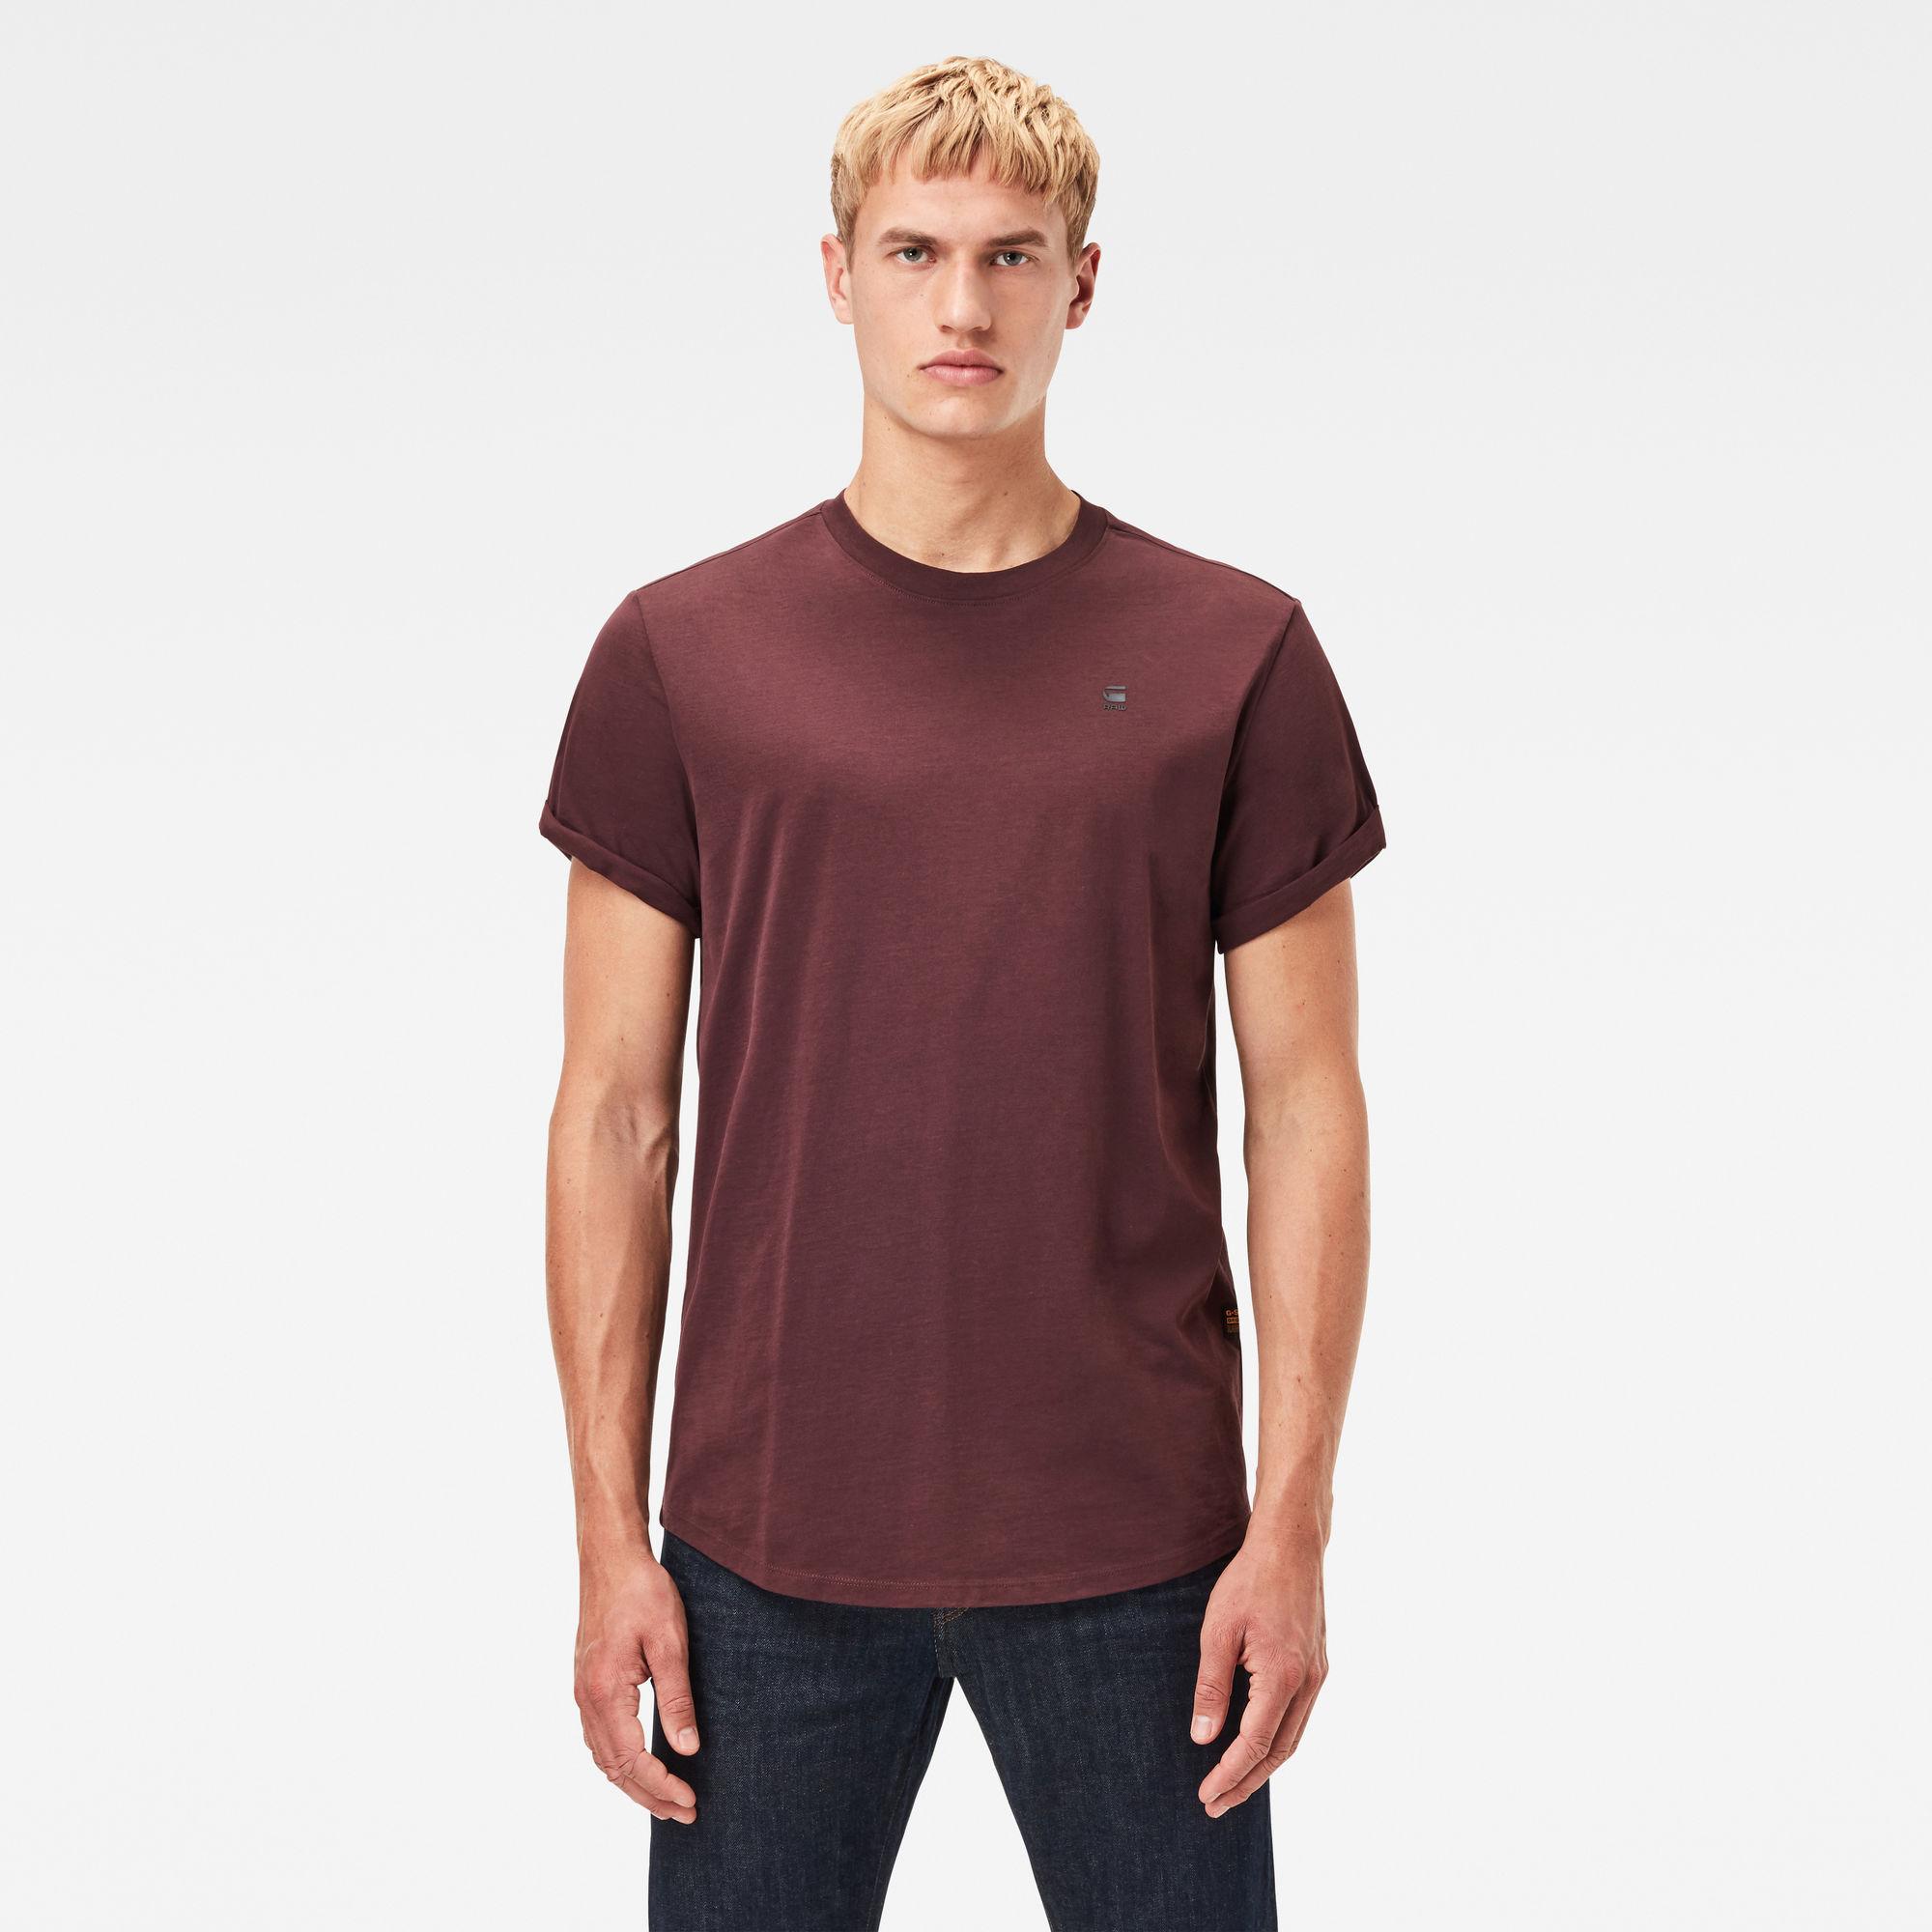 G-Star RAW Hombre Camiseta Lash Morado